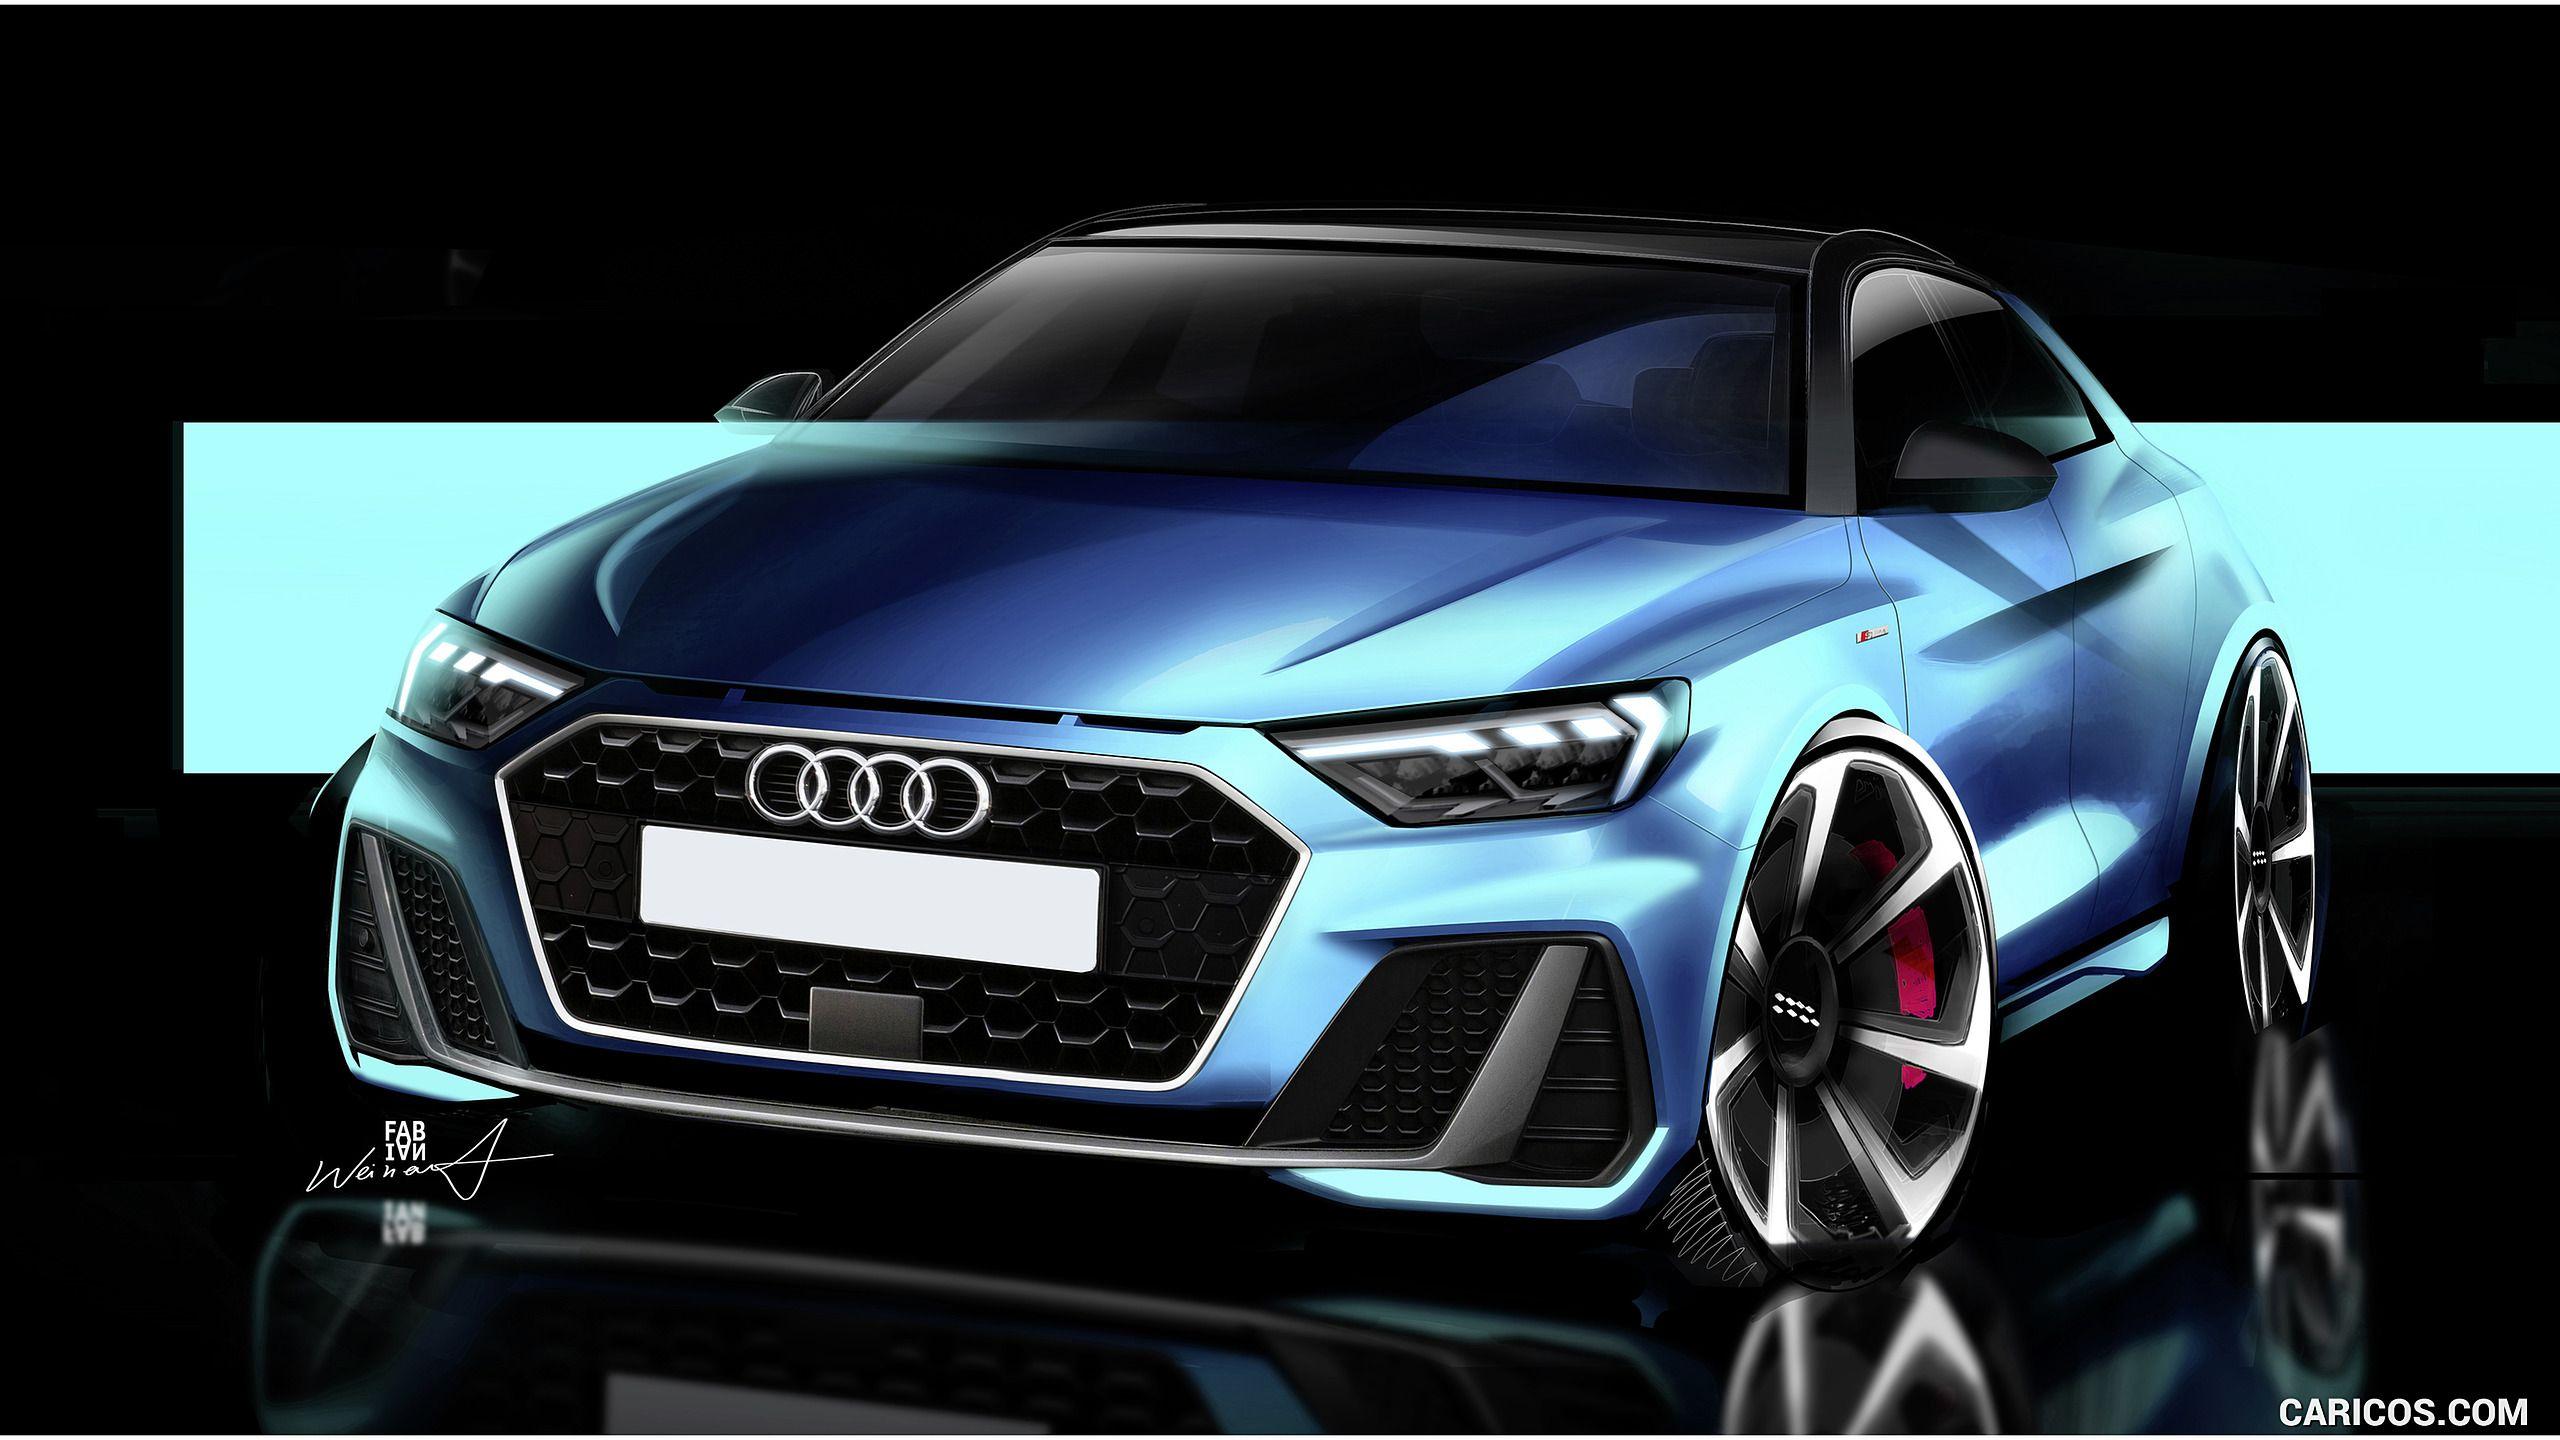 2019 Audi A1 Sportback Wallpaper Audi A1 Sportback Audi A1 Audi